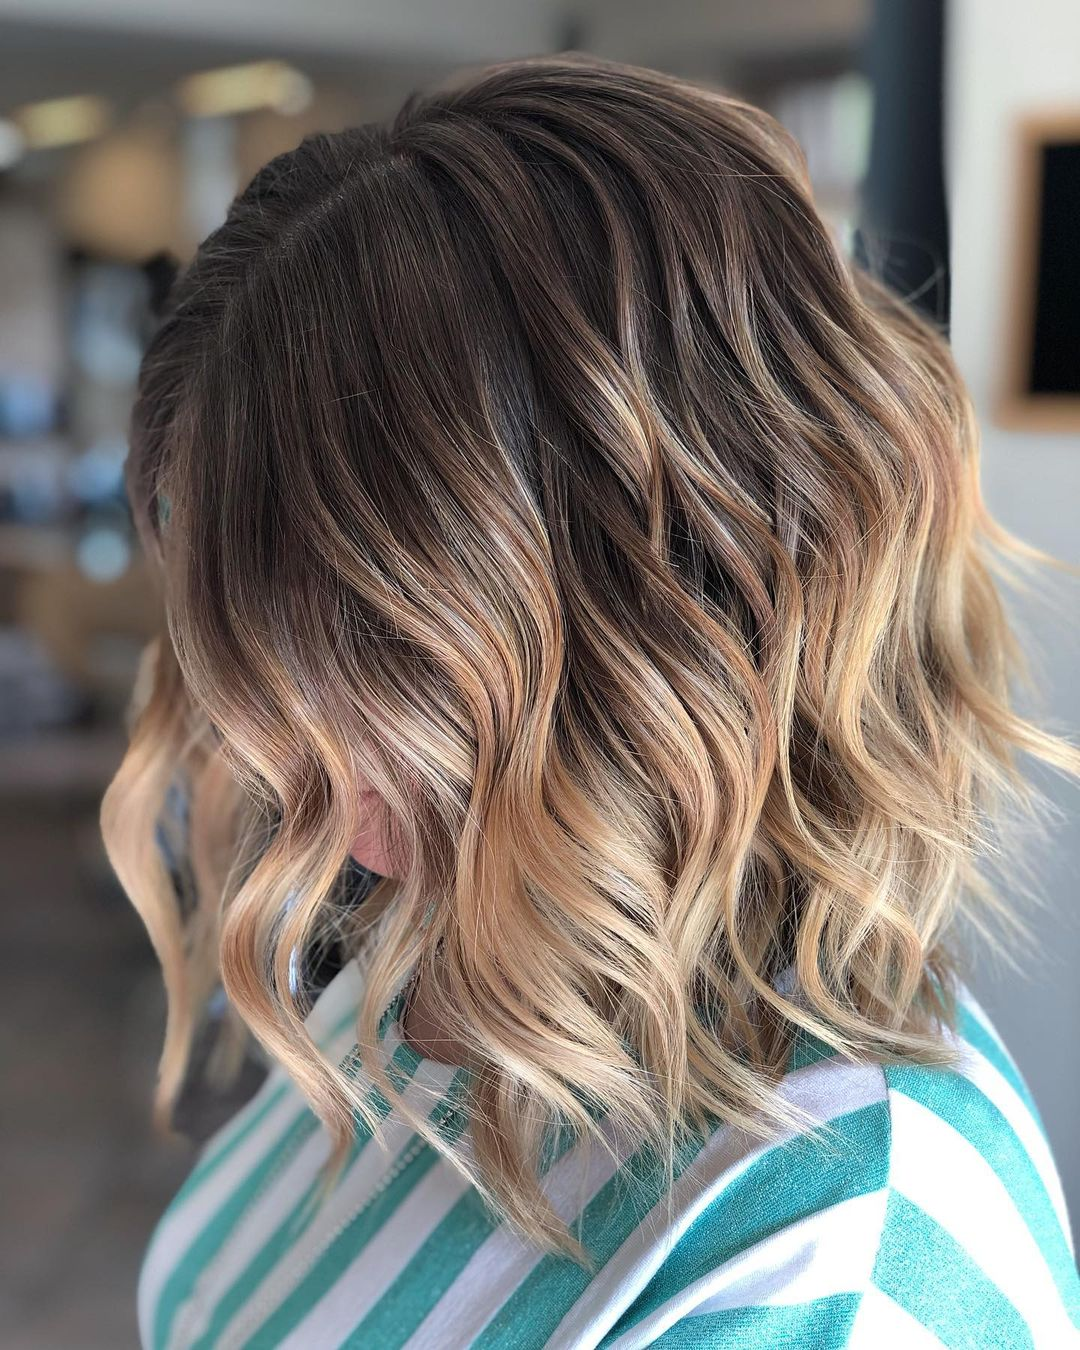 Balayage for Short Hair 12 Stunning Hair Color Ideas